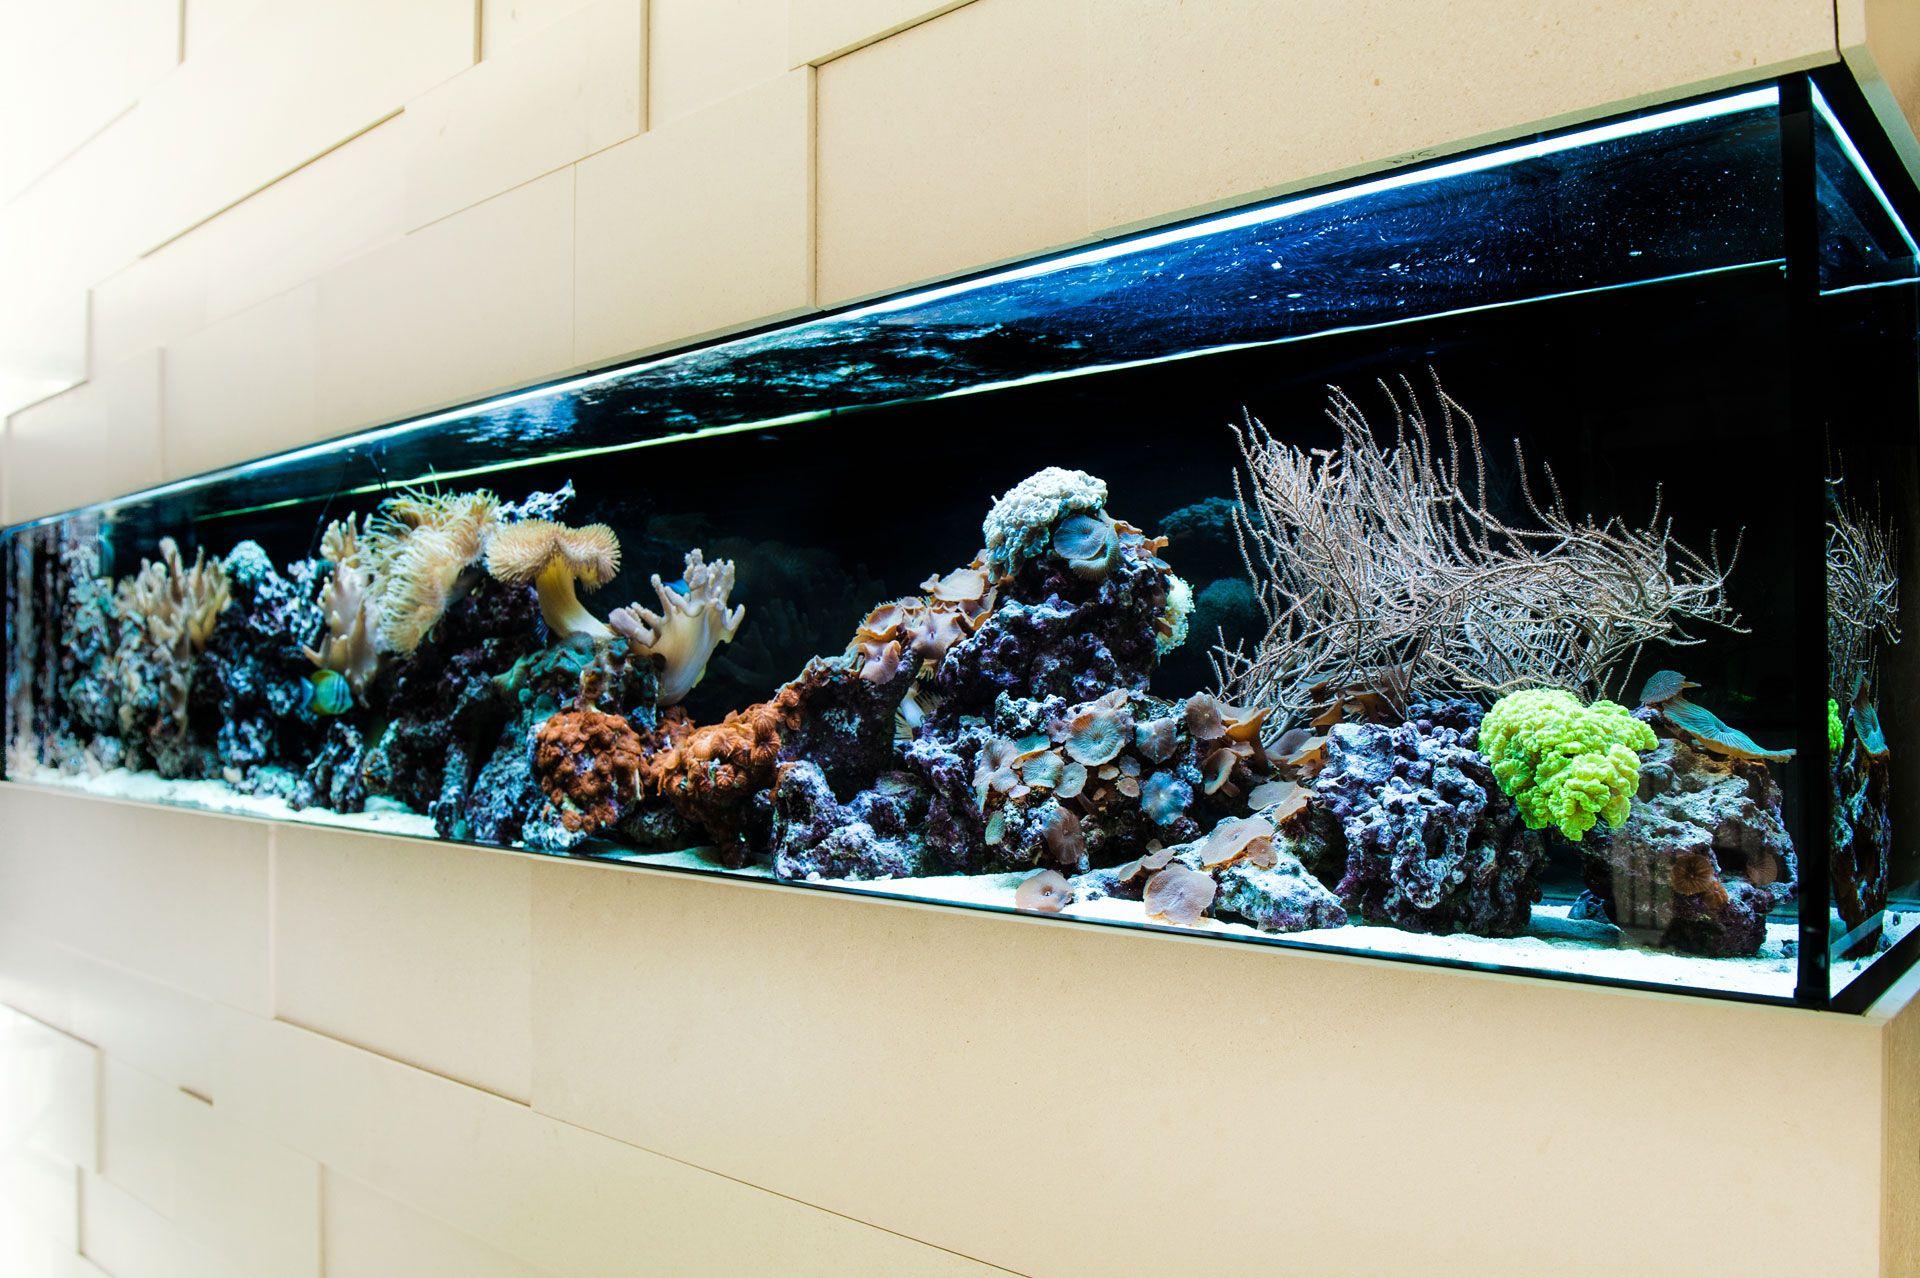 raumteiler aquarium pinterest raumteiler ausstellungsraum und aquarium. Black Bedroom Furniture Sets. Home Design Ideas